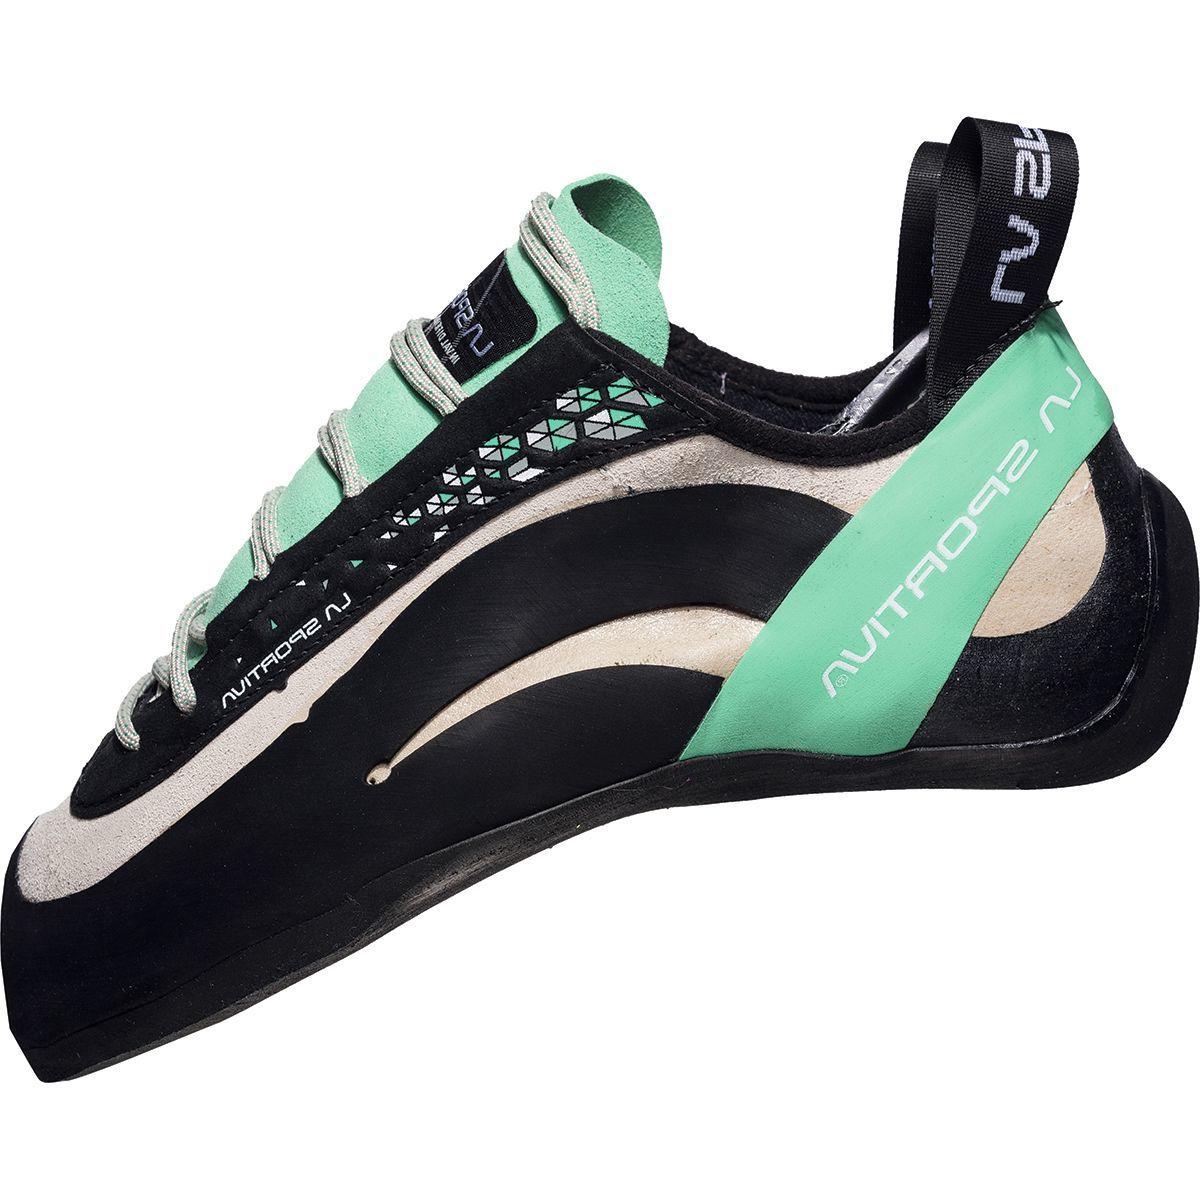 La Sportiva Miura Climbing Shoe - Women's